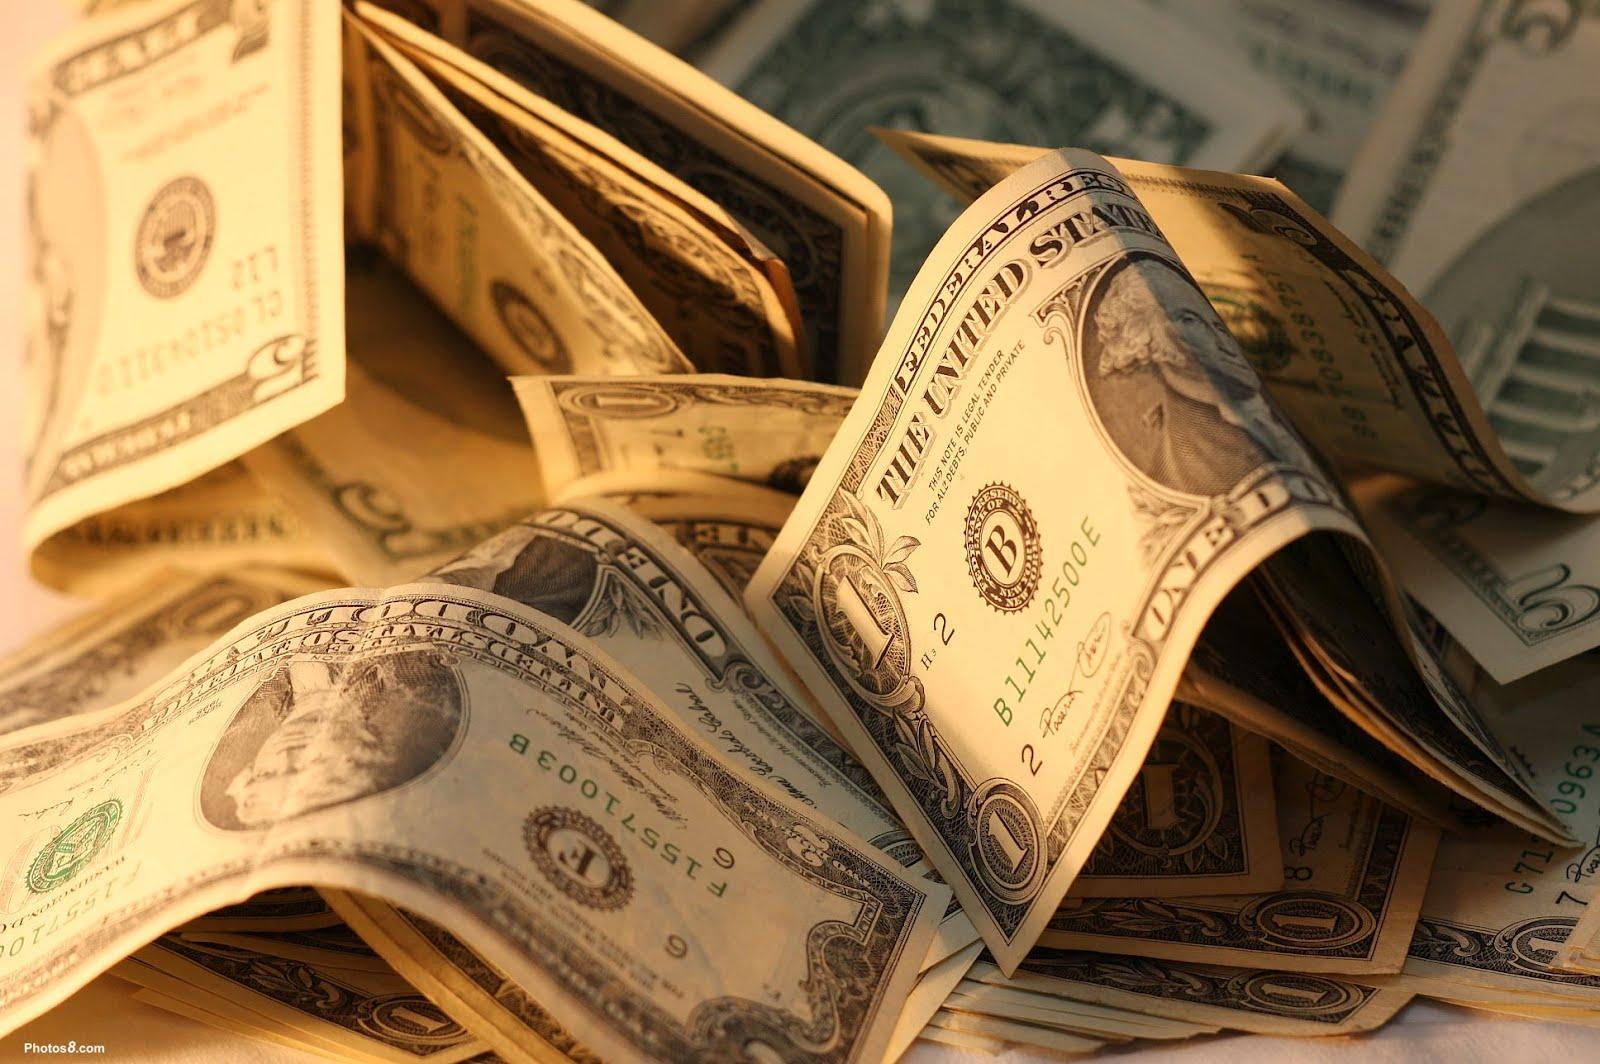 http://4.bp.blogspot.com/-GfGfEoflU20/UD96h41_K5I/AAAAAAAABJE/7_OyhvwZvVI/s1600/money_cash_desktop_1936x1288_hd-wallpaper-561329.jpg